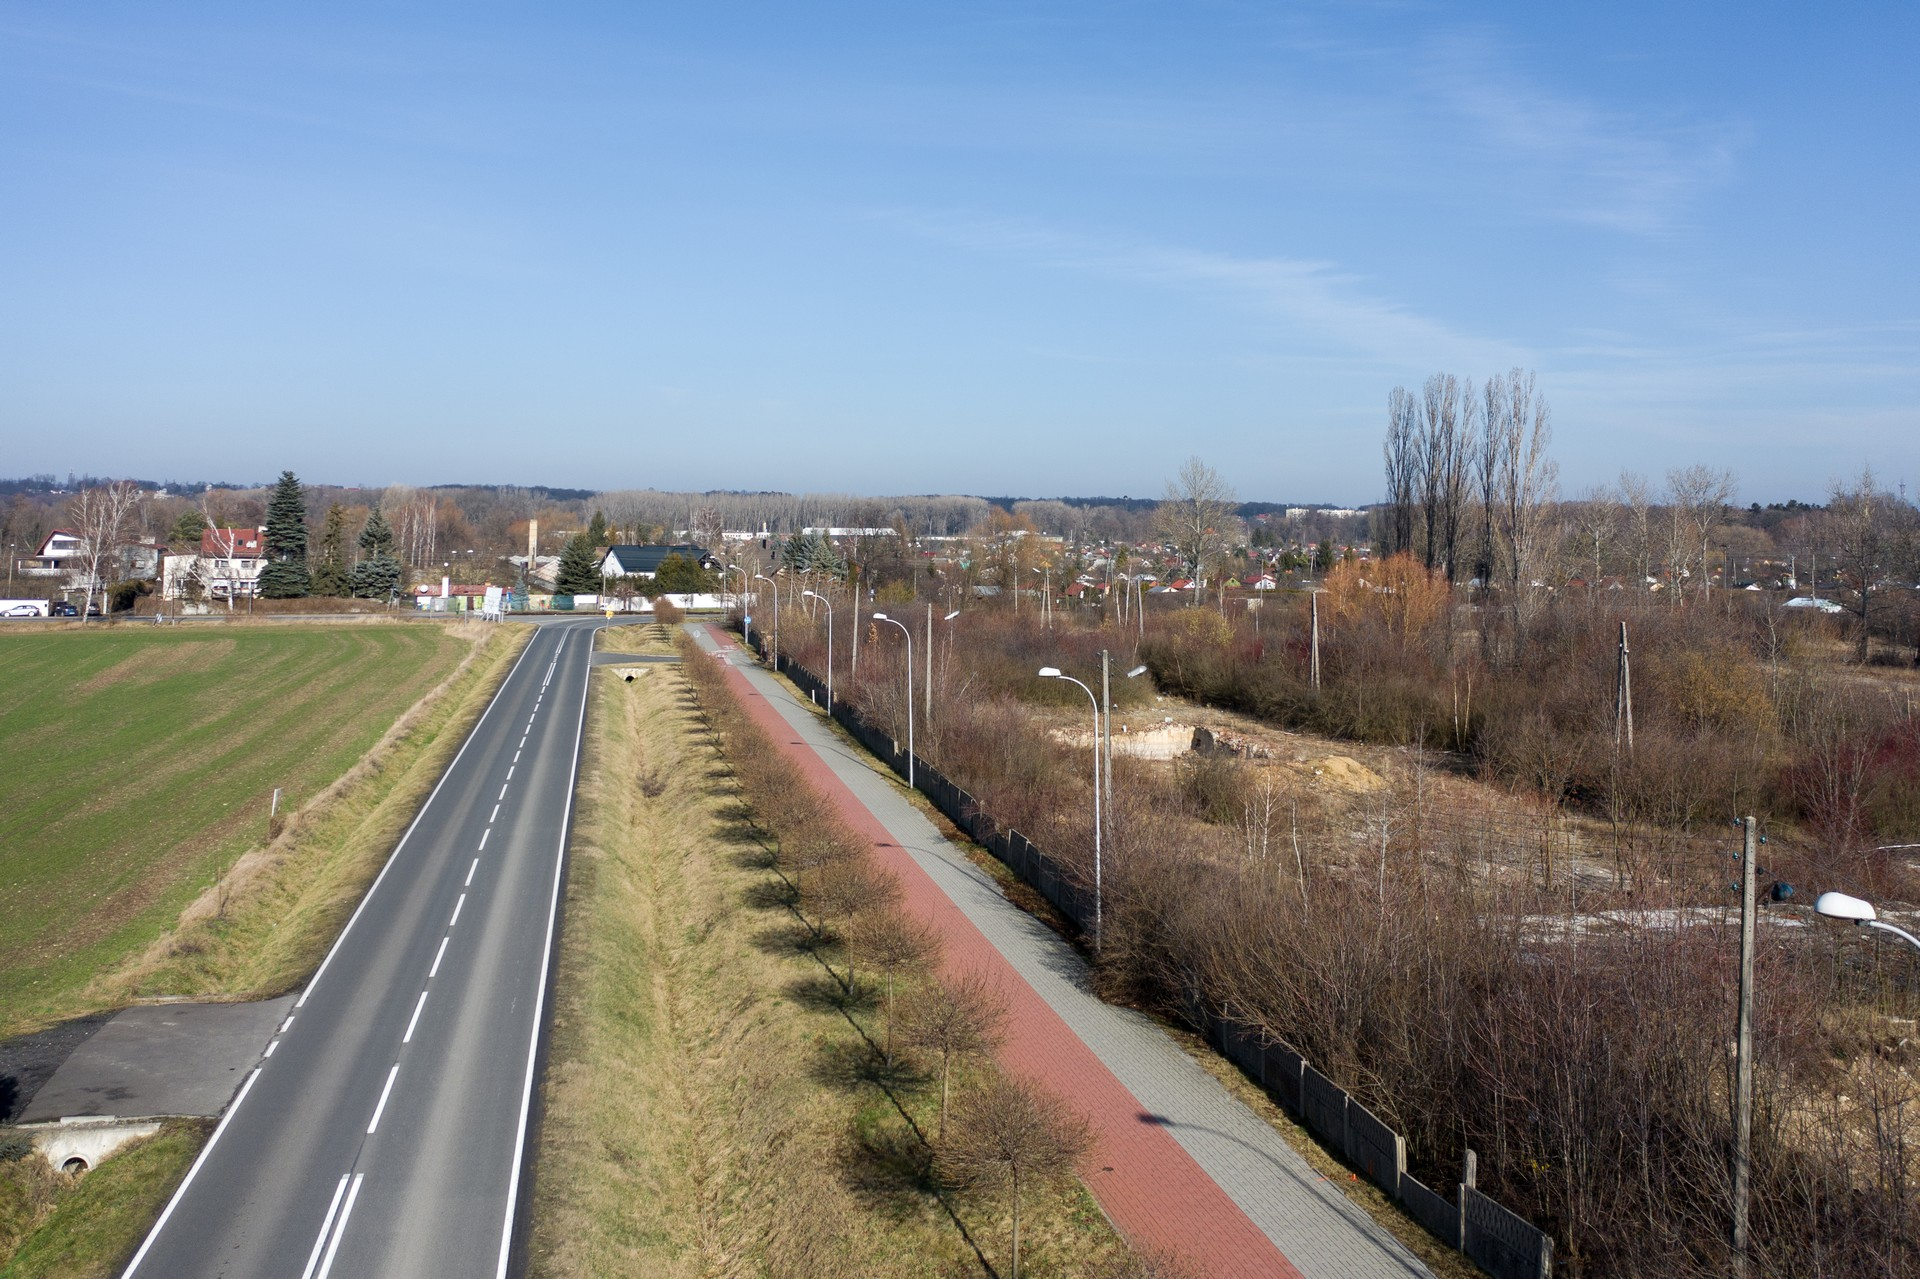 Belweder Park Nysa Zdjecia z Drona 20.02.2020 3